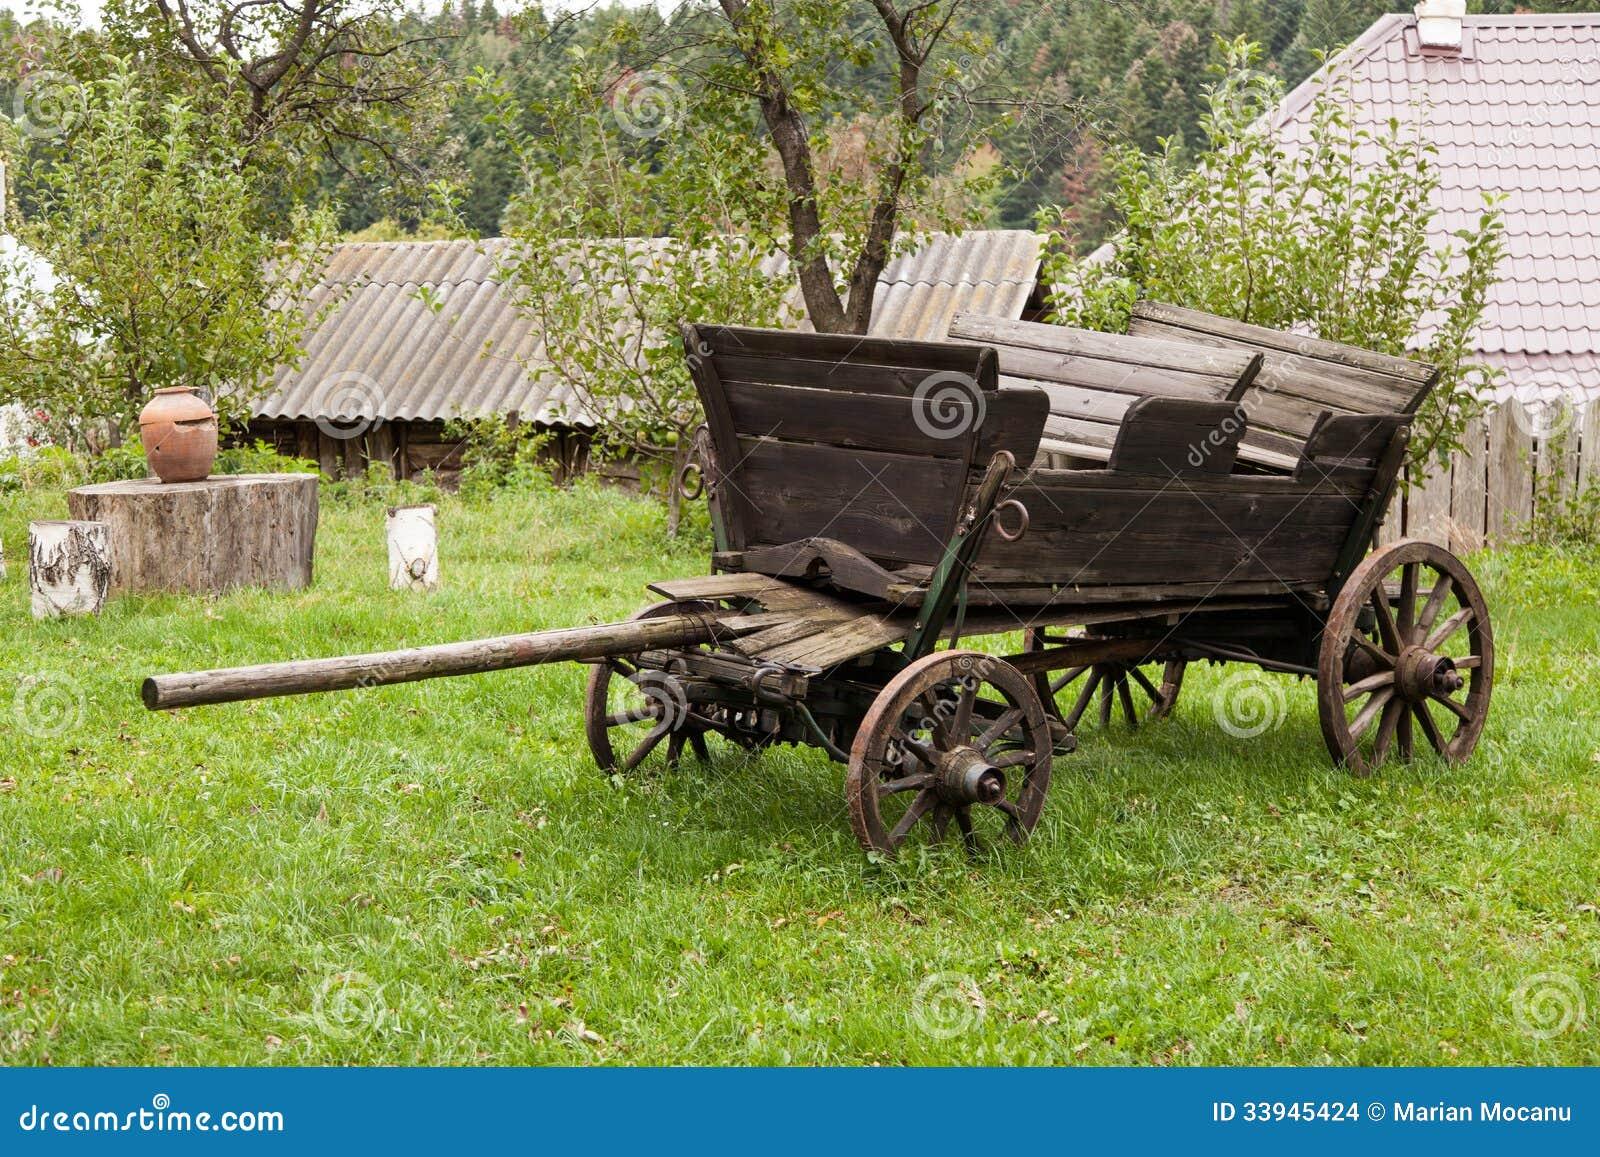 Old cart stock photo. Image of pushcart, outside, plants - 33945424